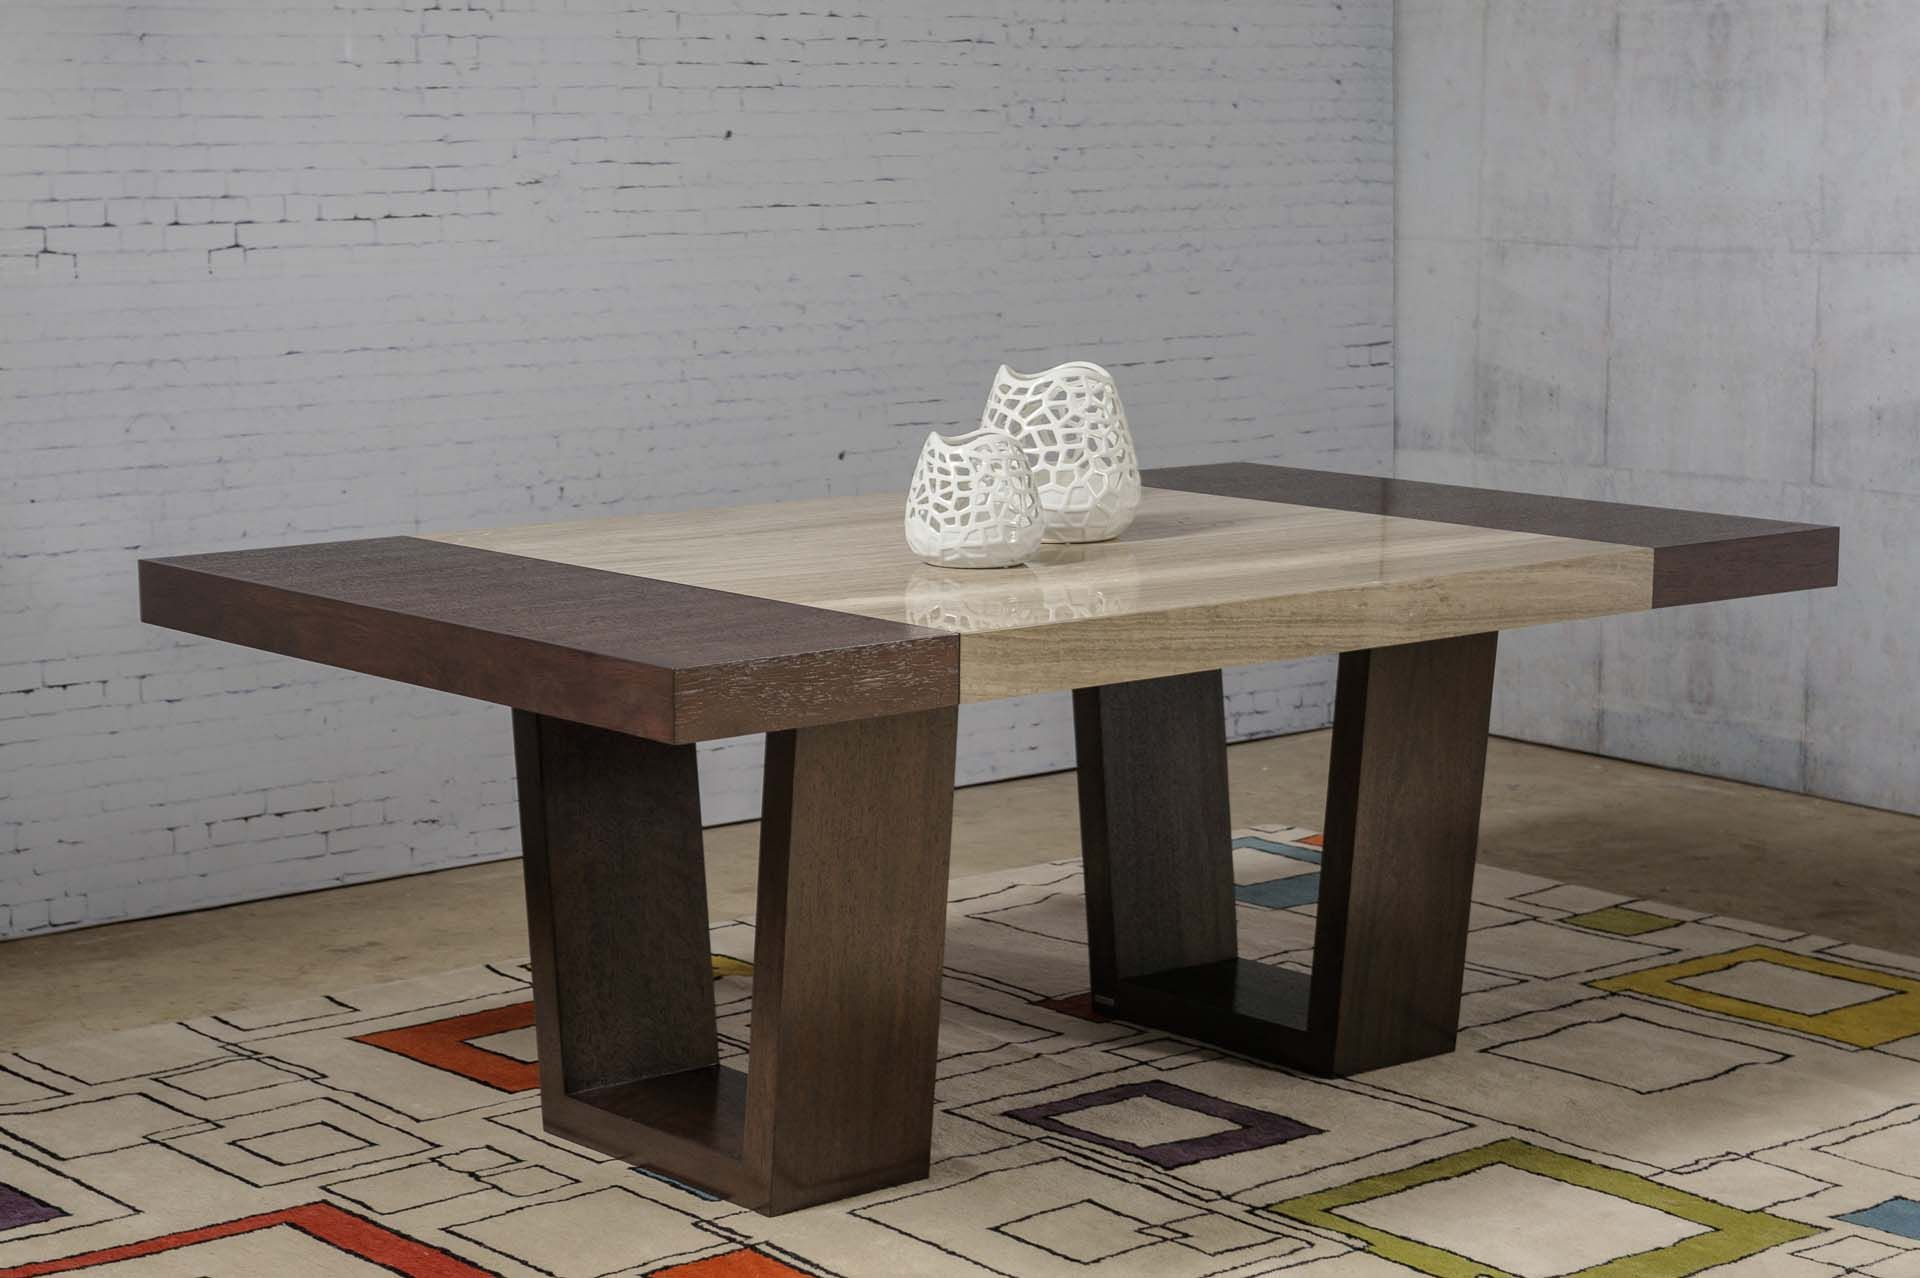 Mesa de comedor urban rectangular con inserto de marmol for Quiero ver comedores